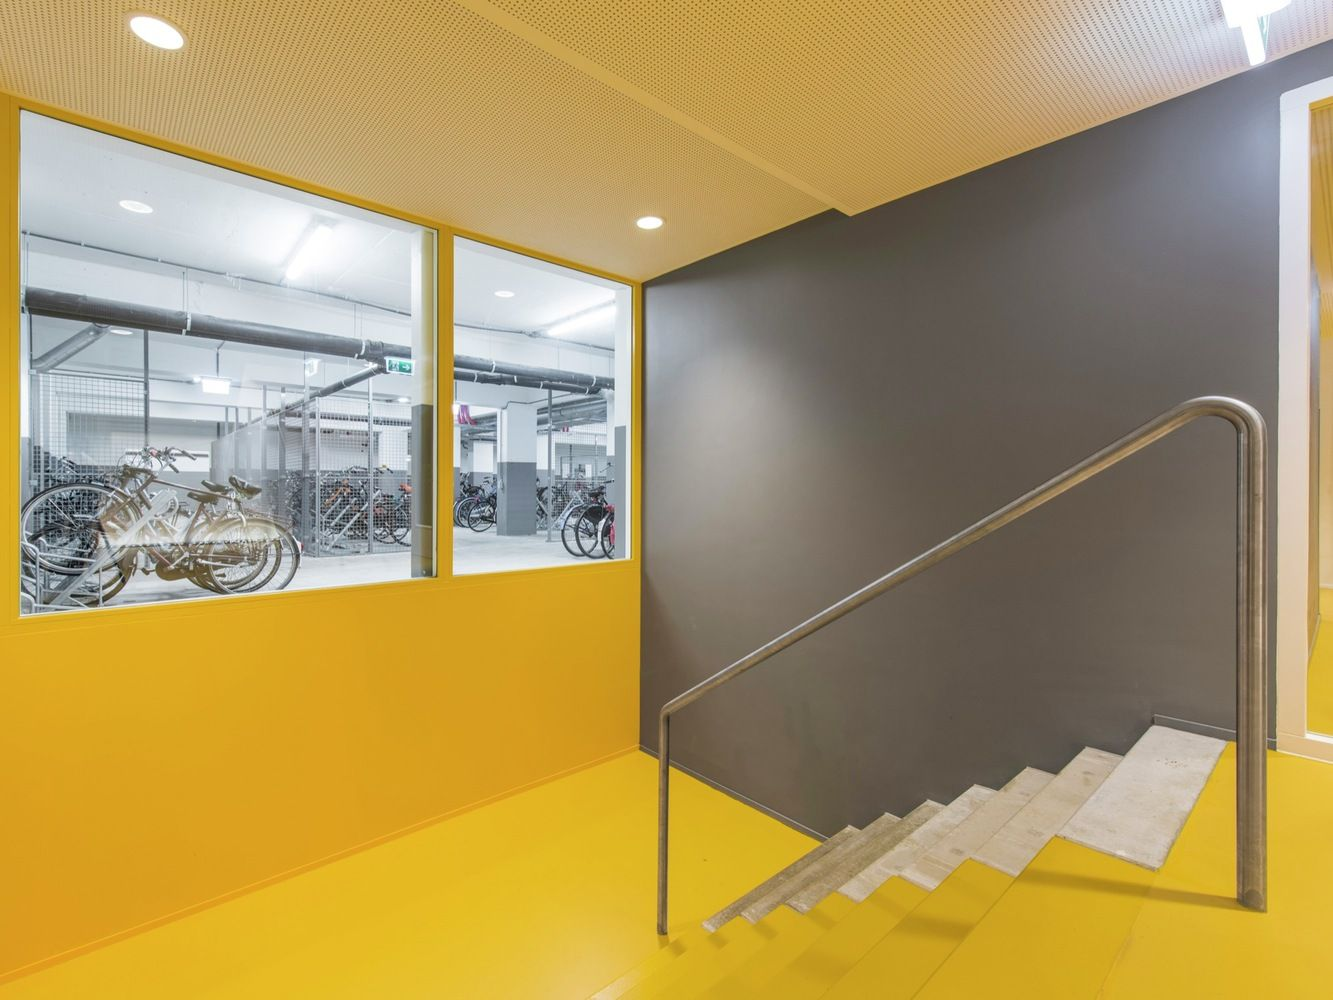 Galeria de Complexo de Moradias Estudantis no Elsevier Office Building / Knevel Architecten - 11